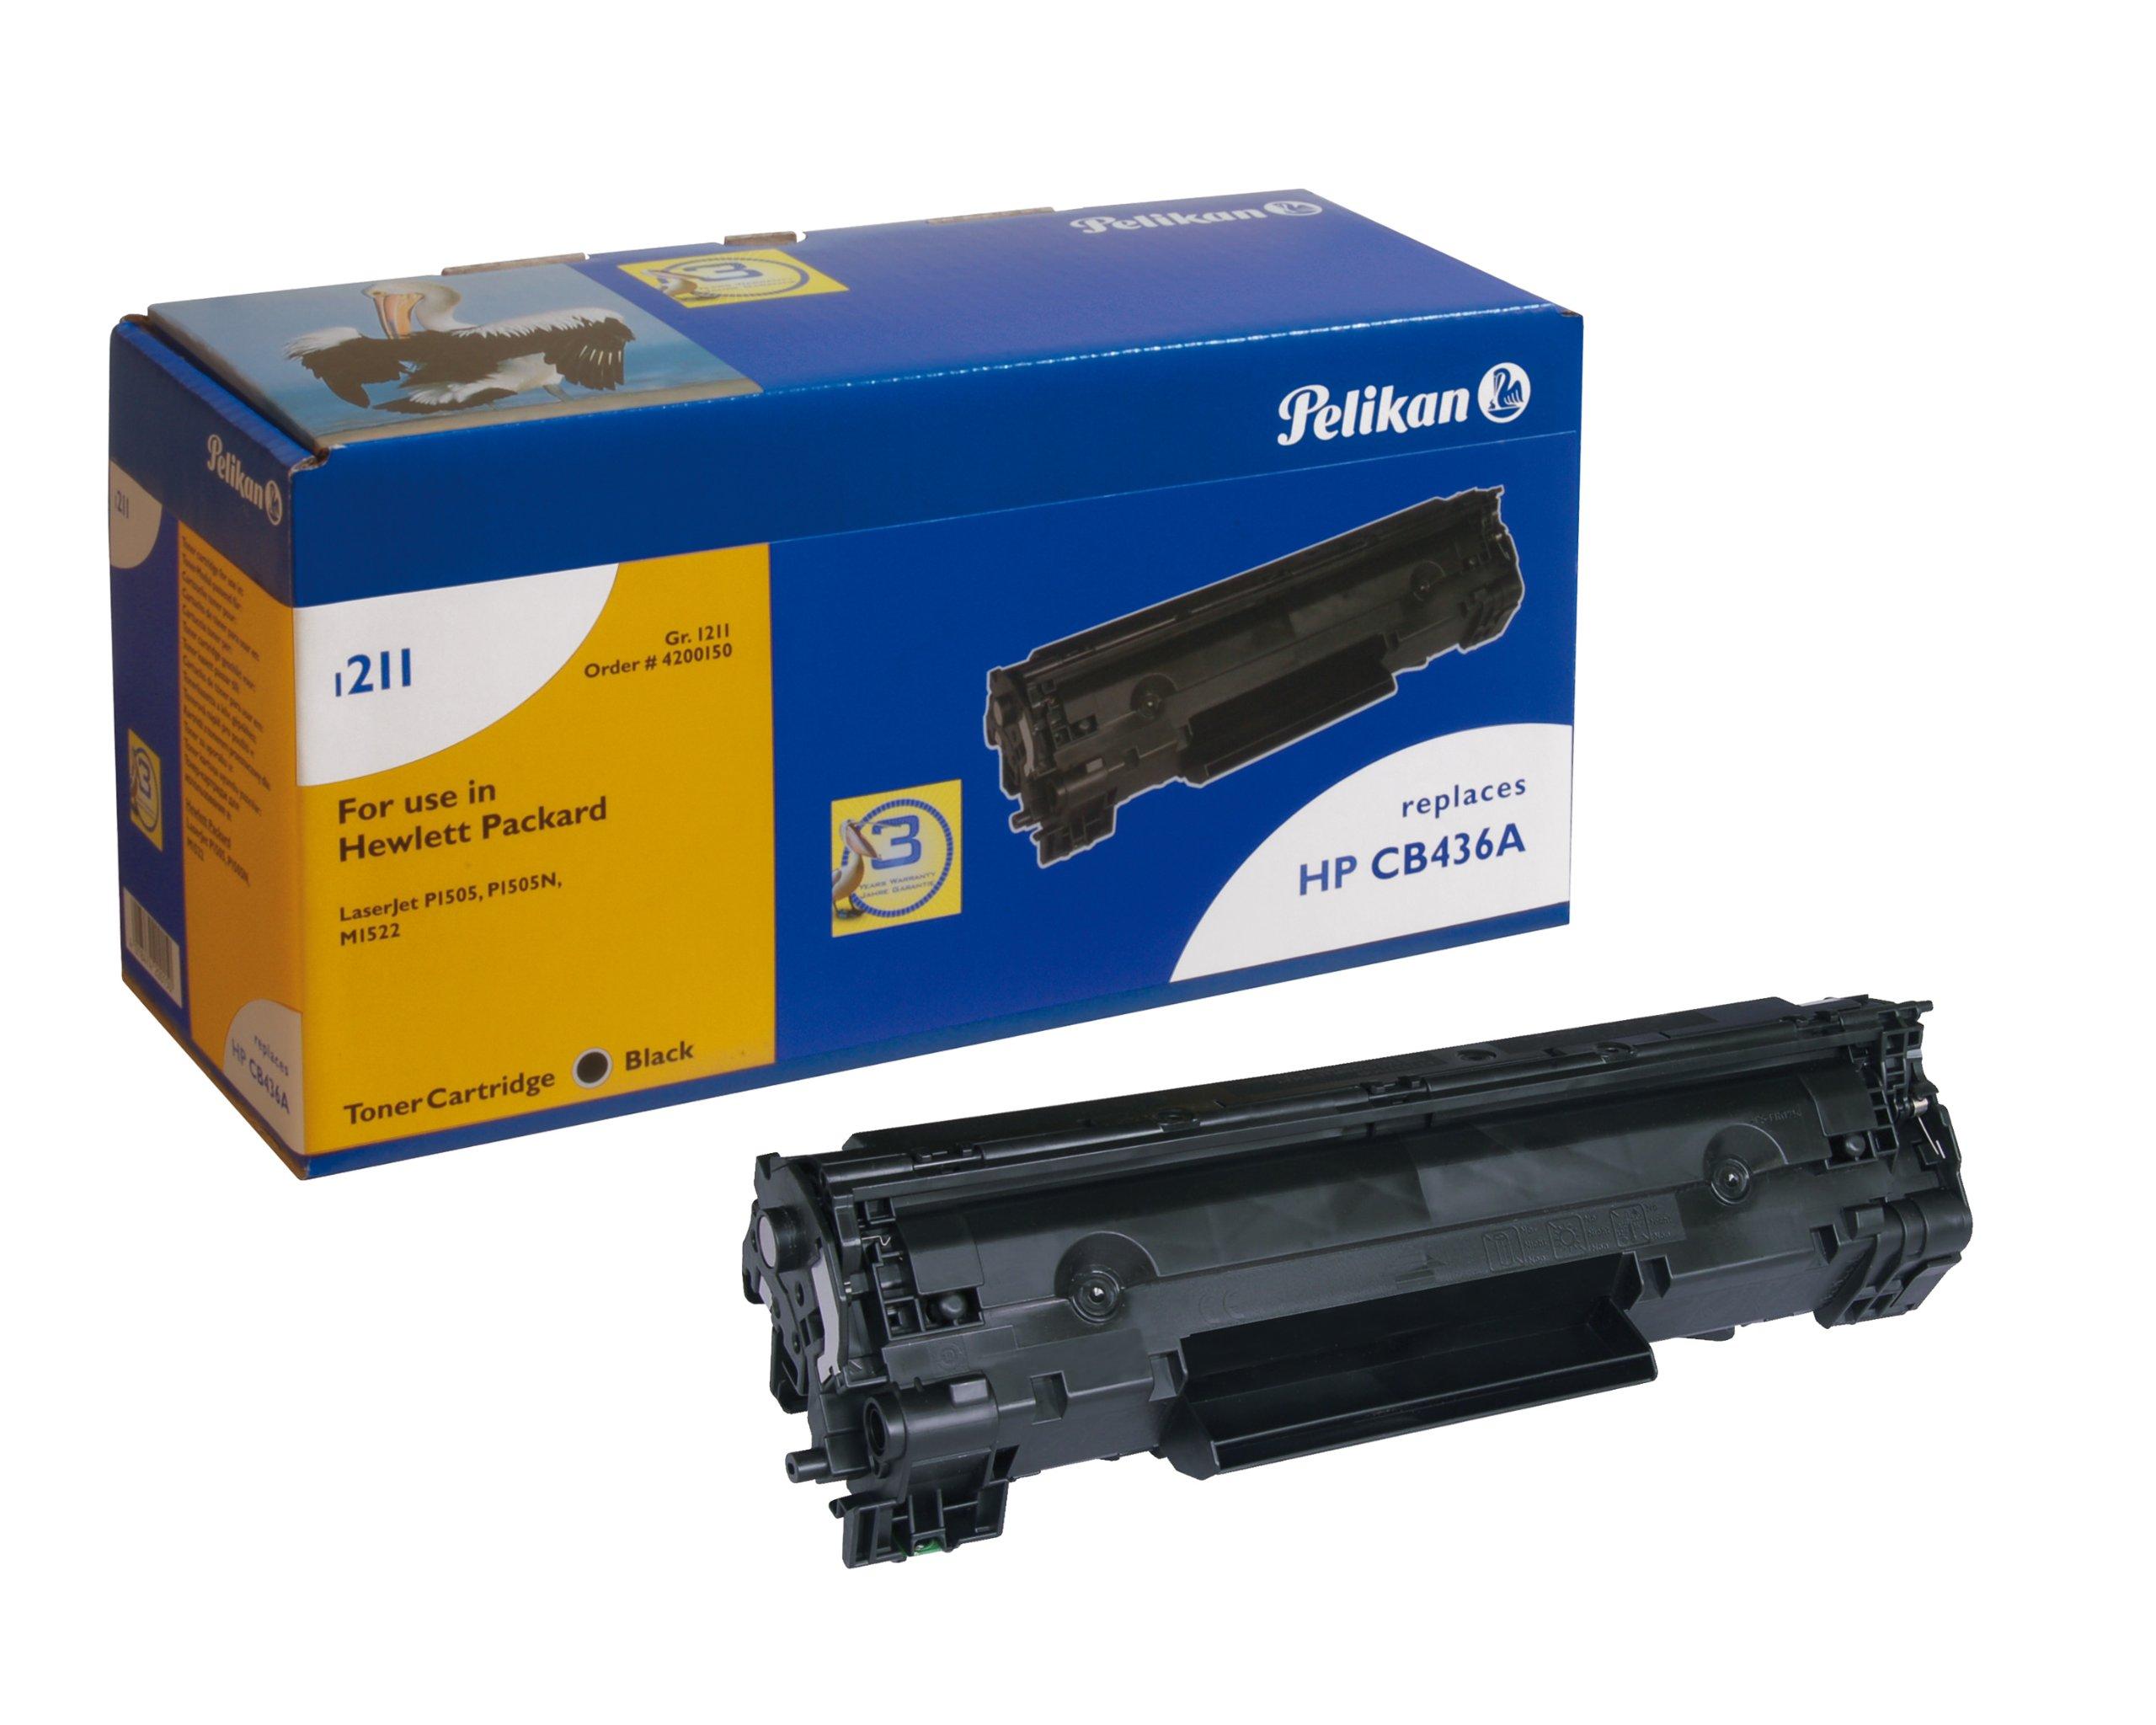 Pelikan-Toner-Modul-1211-ersetzt-HP-CB436A-Schwarz-2800-Seiten